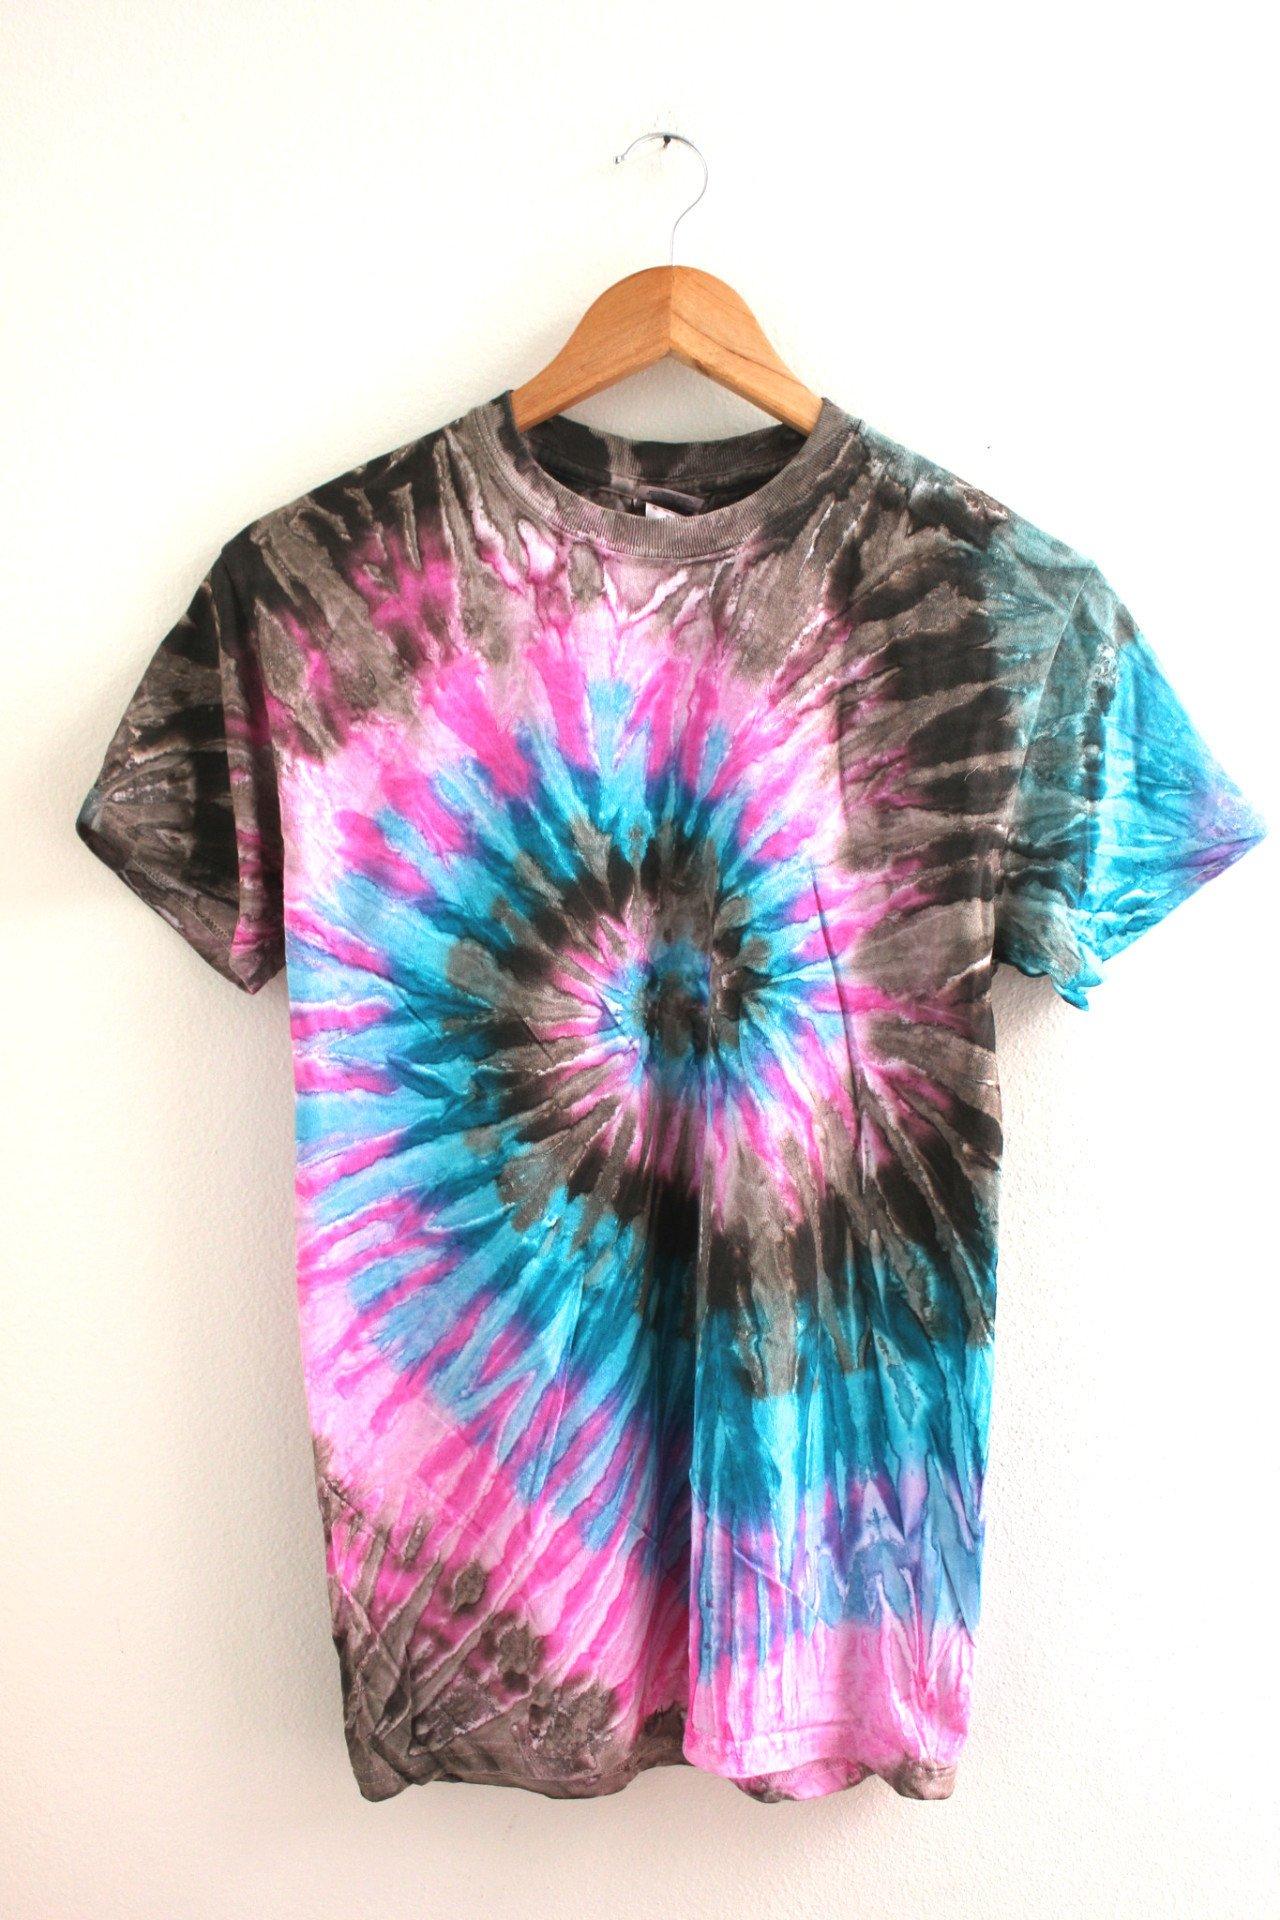 Lotus Tie Dye Unisex Tee Era Of Artists Tie Dye Shirts Patterns Tie Dye Outfits Tie Dye Diy [ 1920 x 1280 Pixel ]